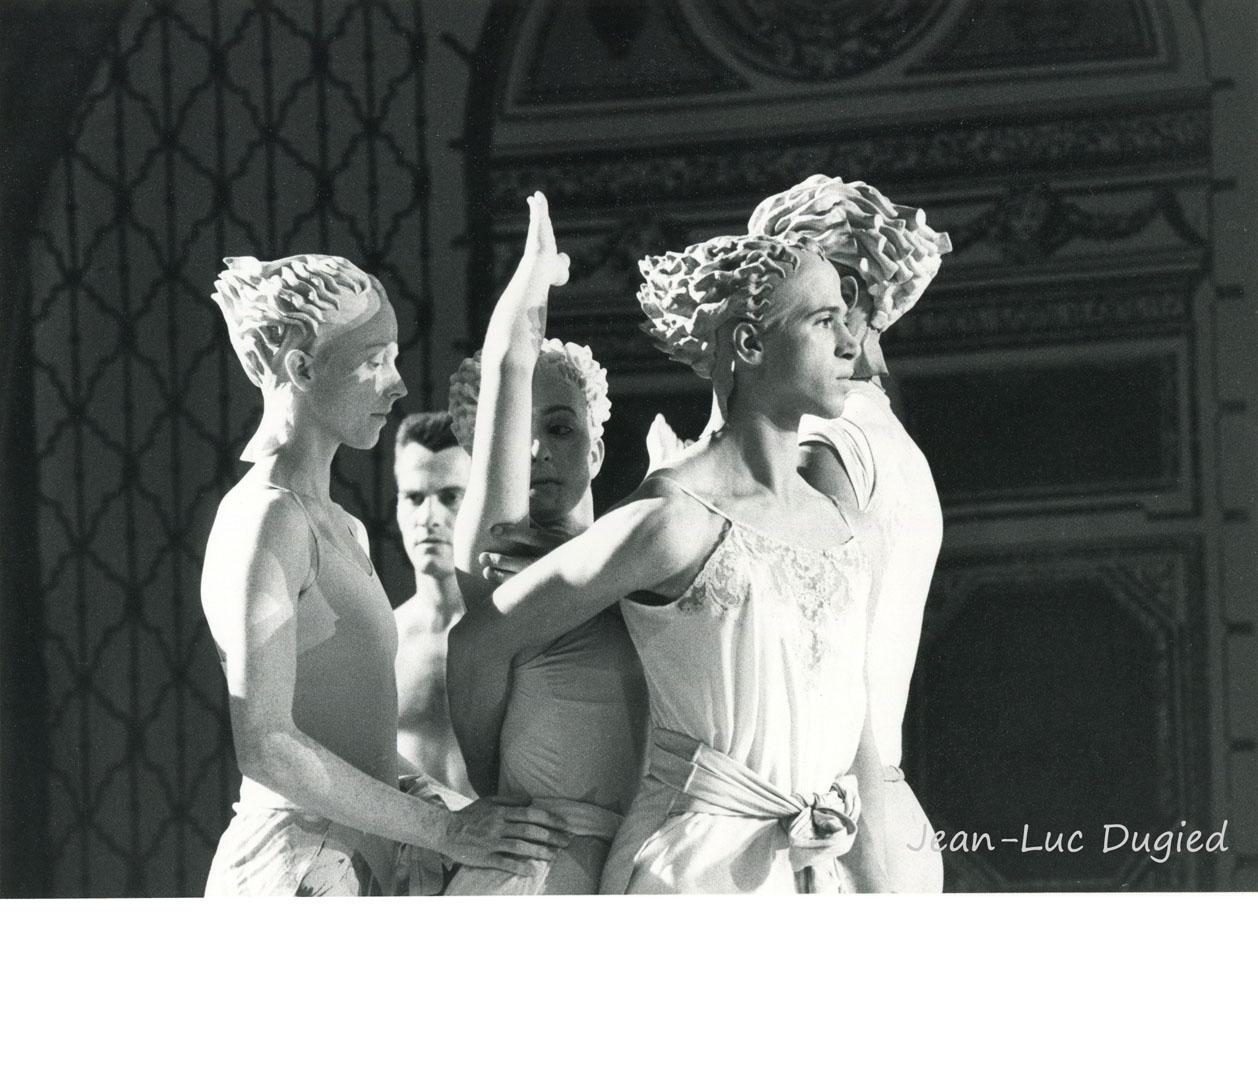 17 Larrieu Daniel - romance en stuc - 1985